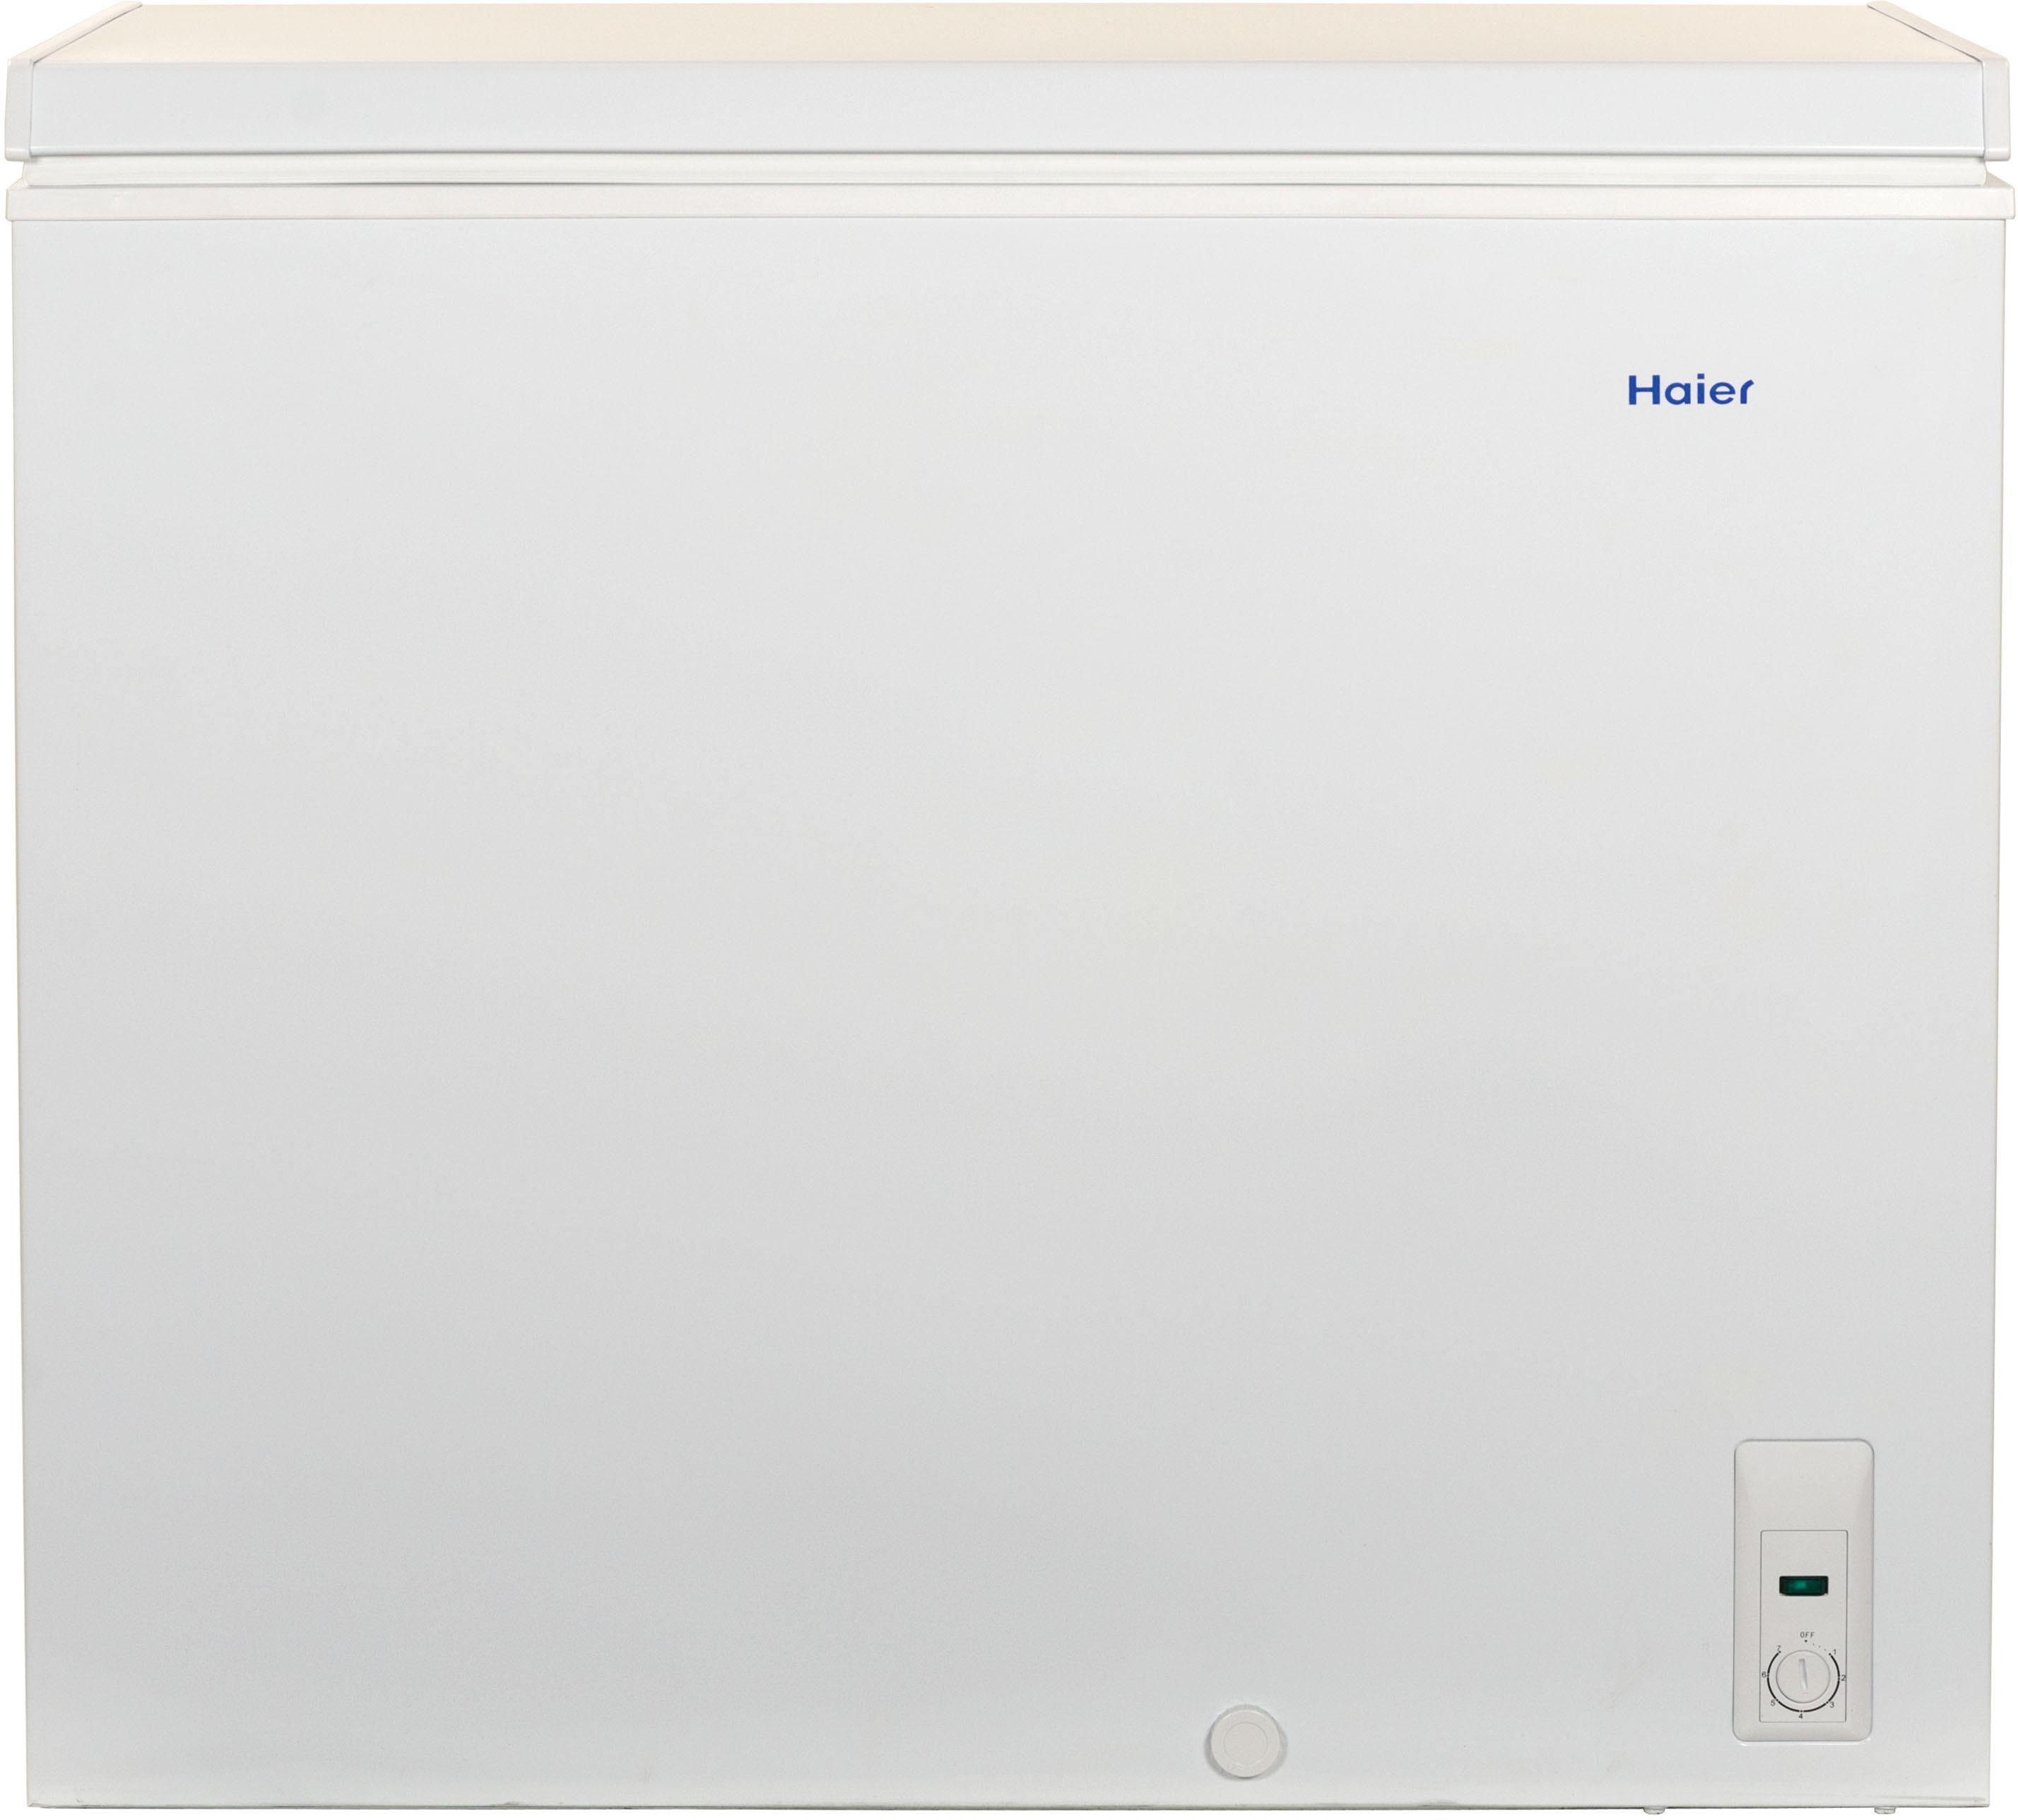 Haier HF71CM33NW 37